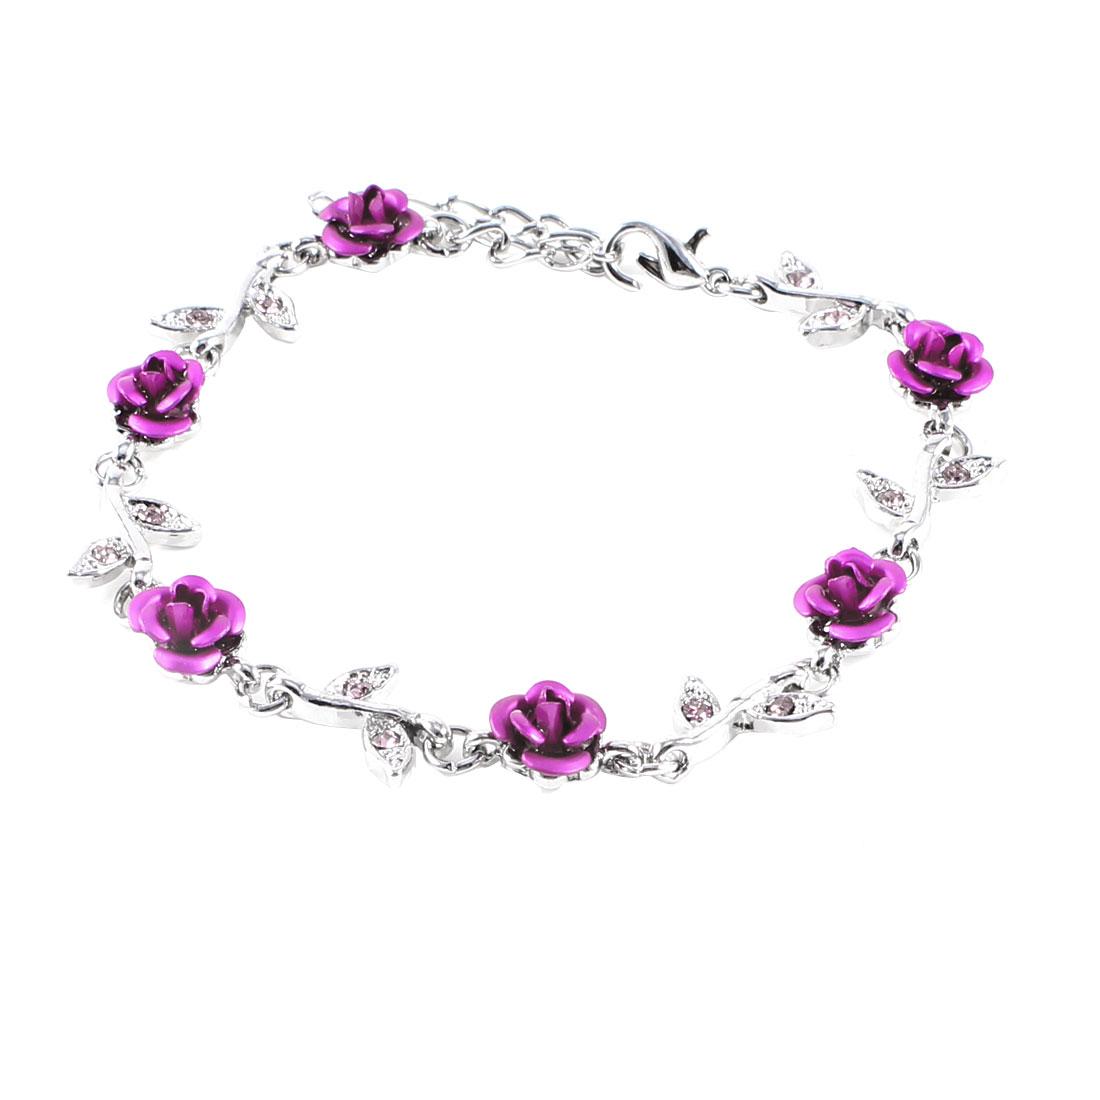 Metal Silver Tone Purple Rose Flowers Decor Wrist Chain Bracelet Bangle for Girl